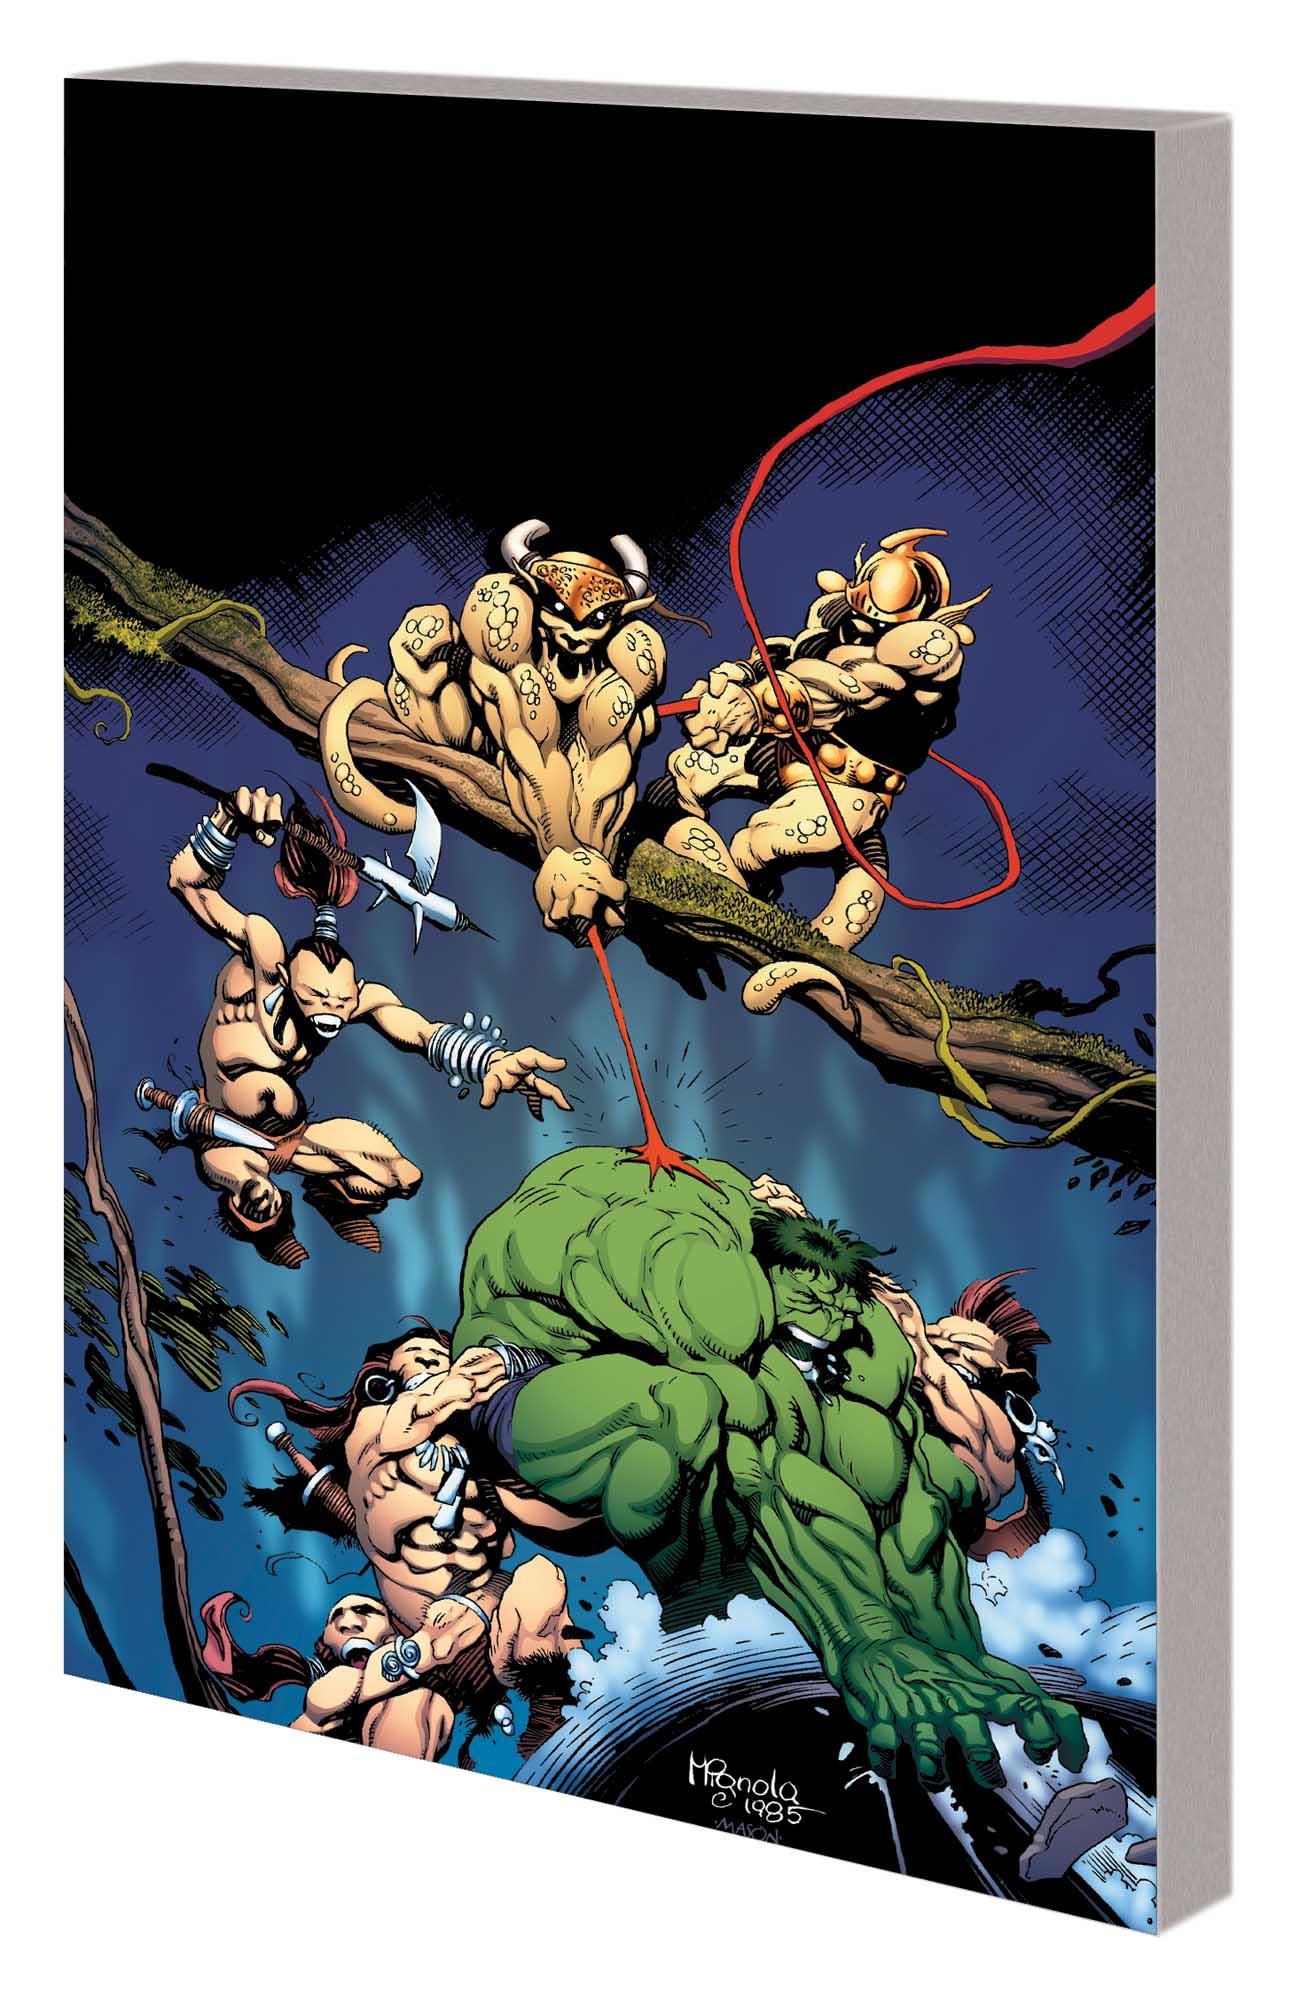 Incredible Hulk: Crossroads (Trade Paperback)